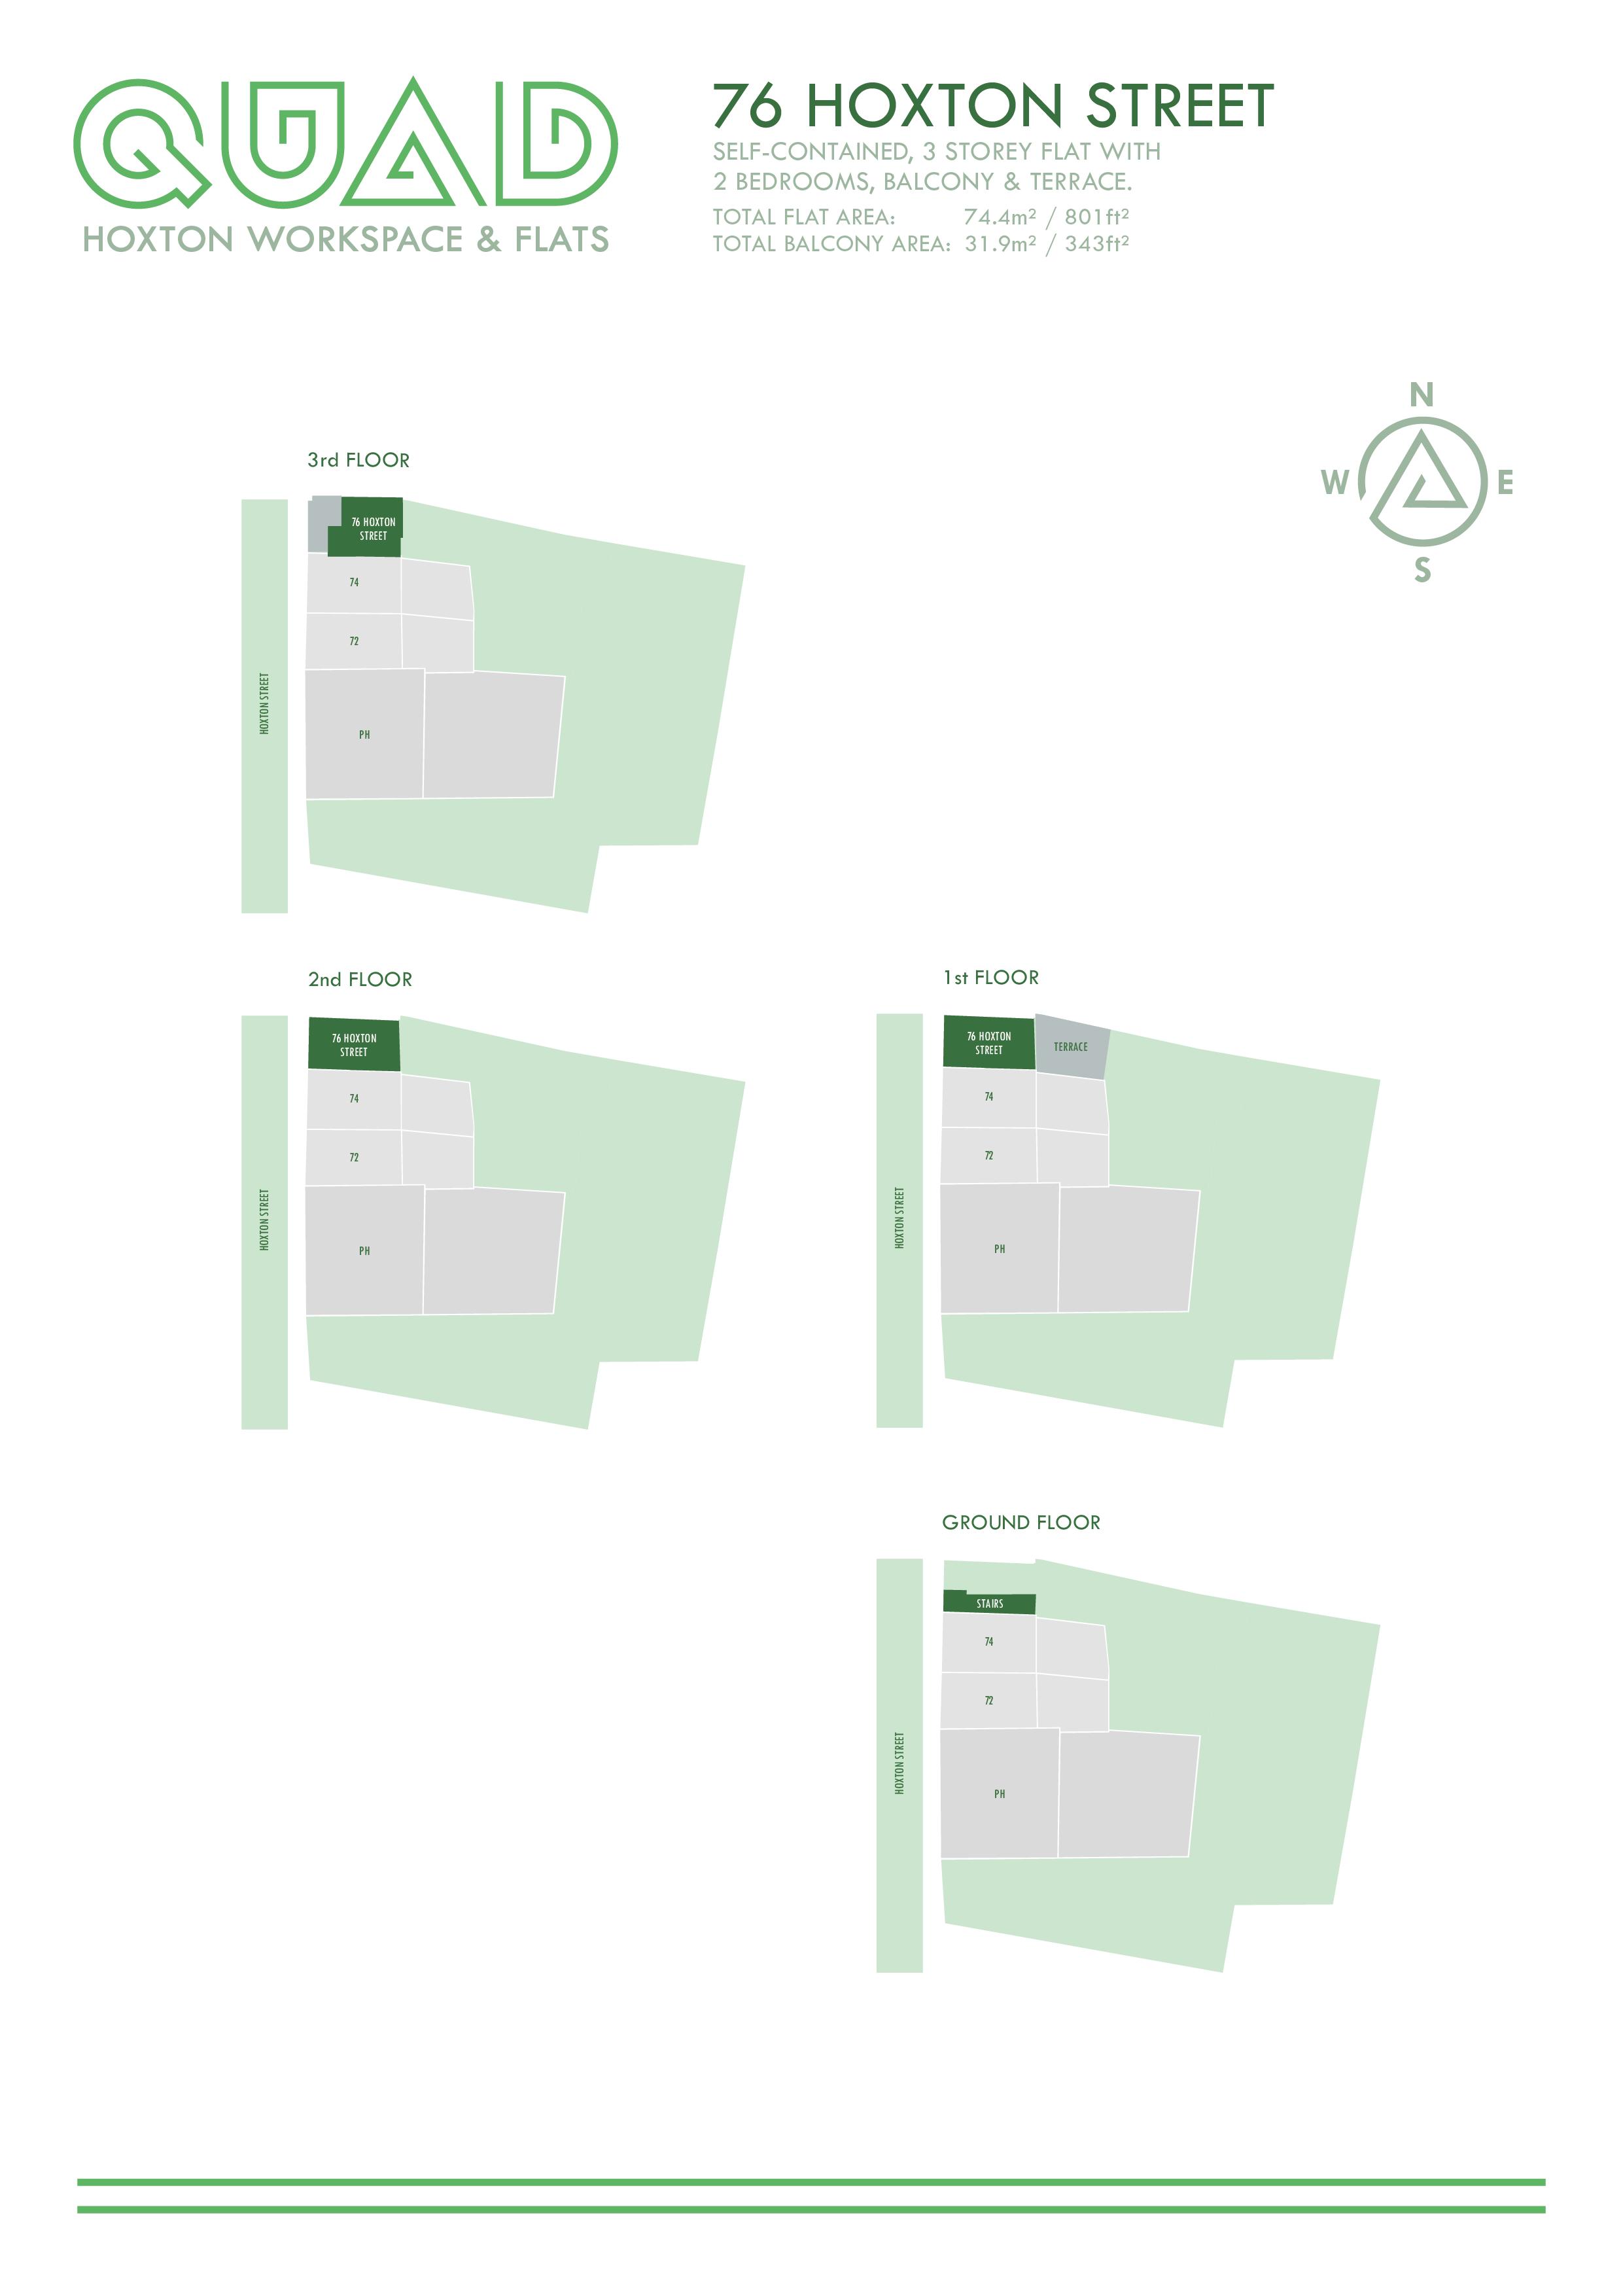 DCP Hoxton Floorplans5-02.png